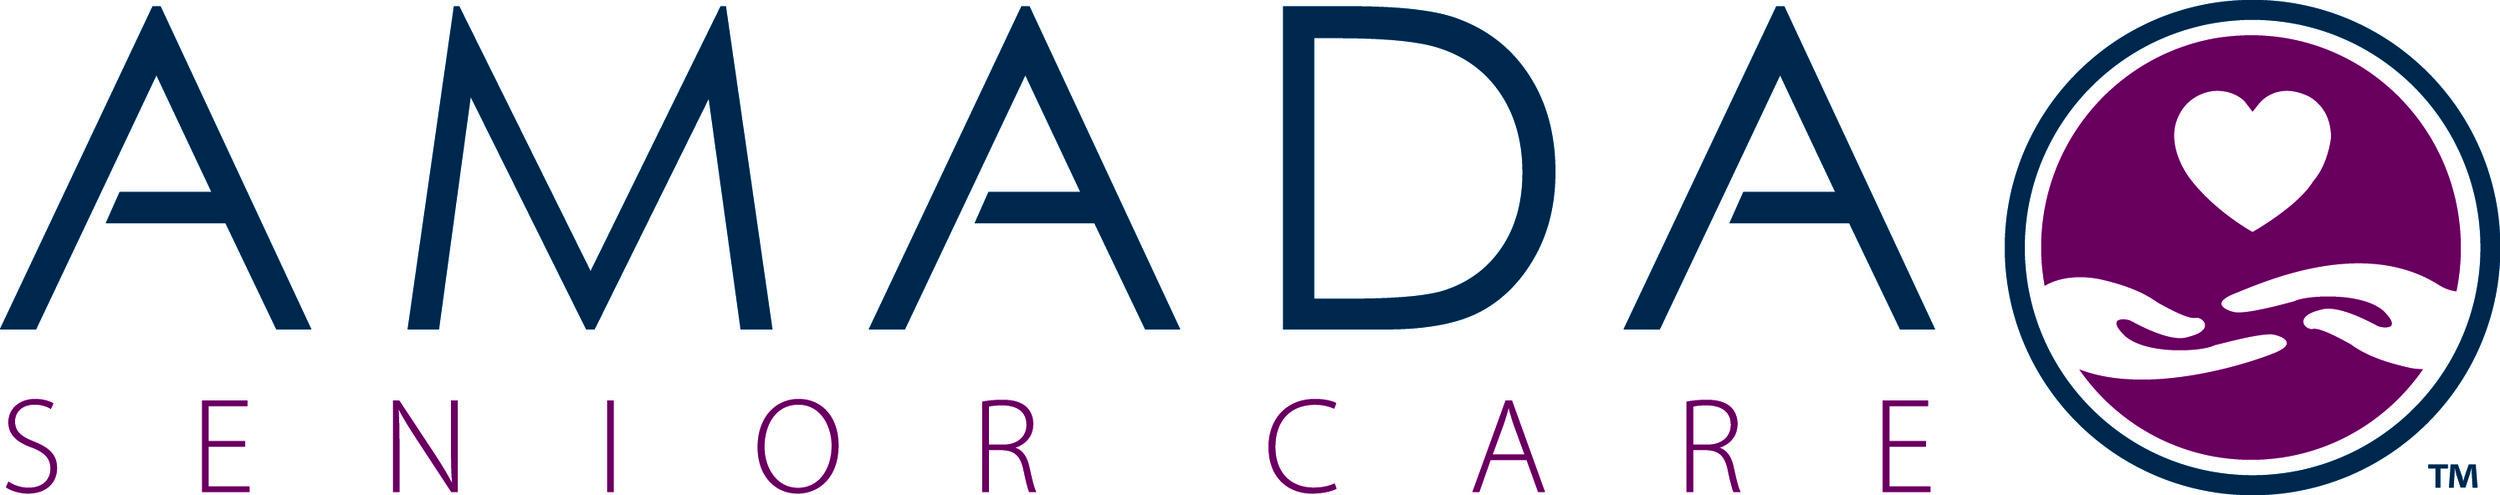 AMADA_Logo_2color_PMS539C_PMS222C.jpg